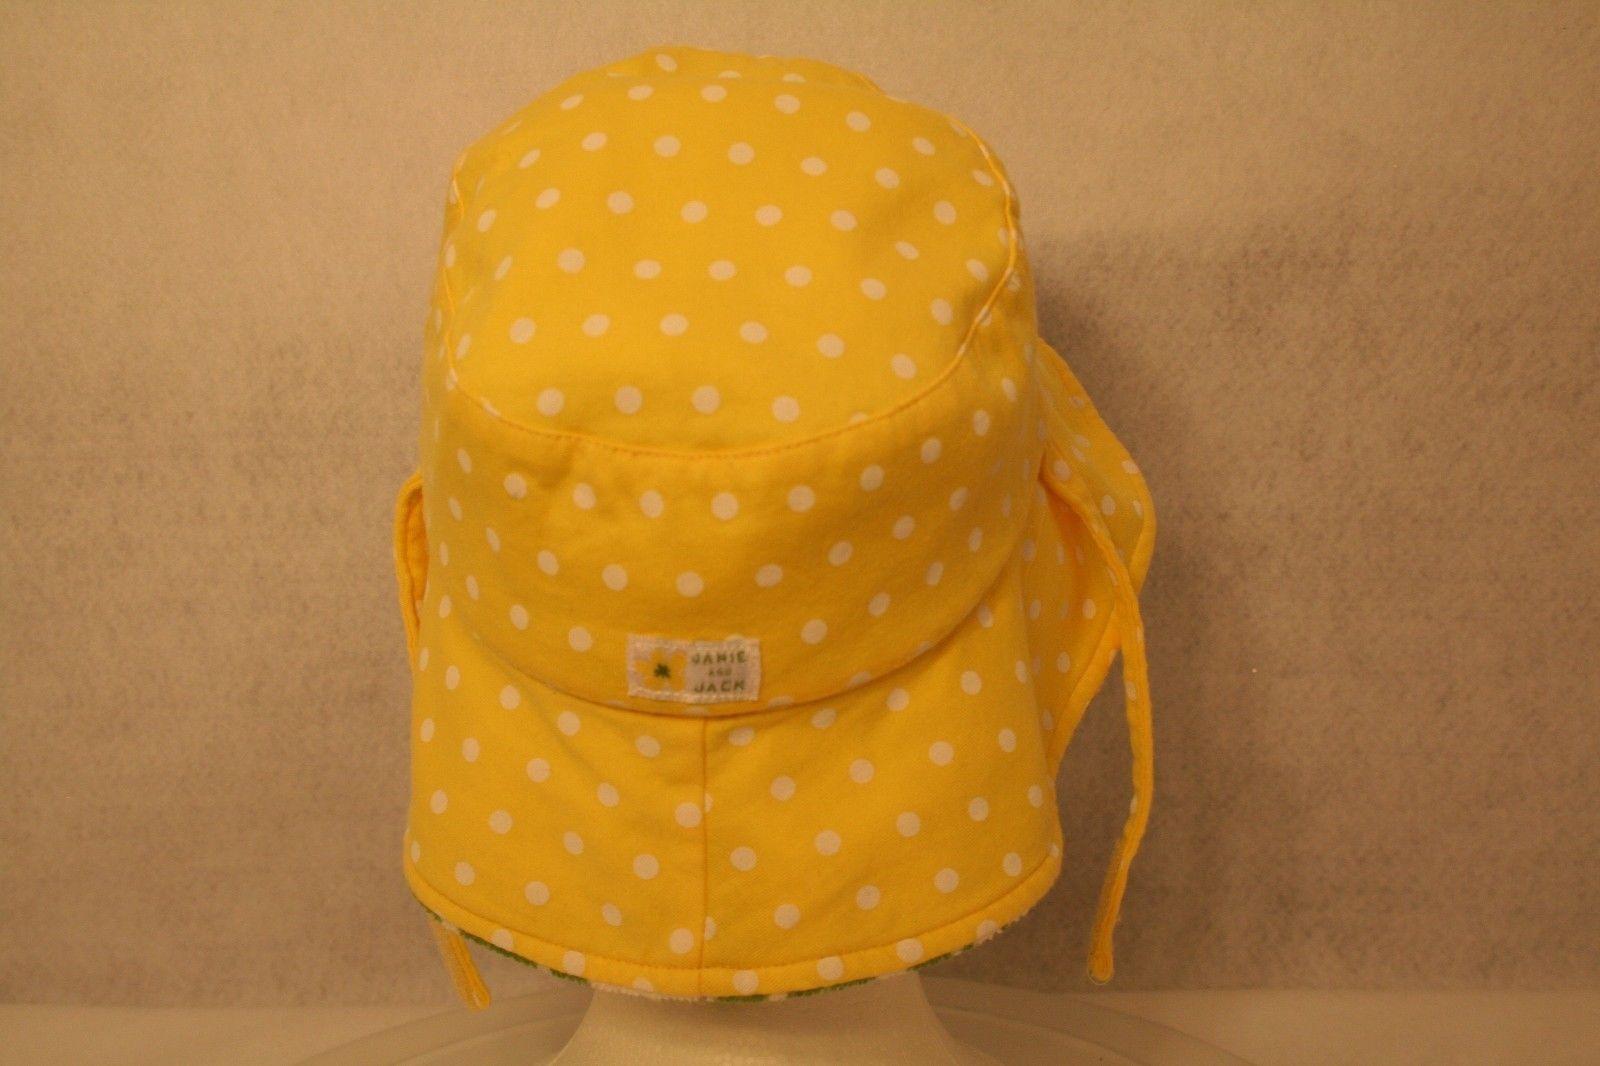 Janie & Jack Child Reversible Sun Hat Green daisy yellow polka dot w/adjust ties image 3